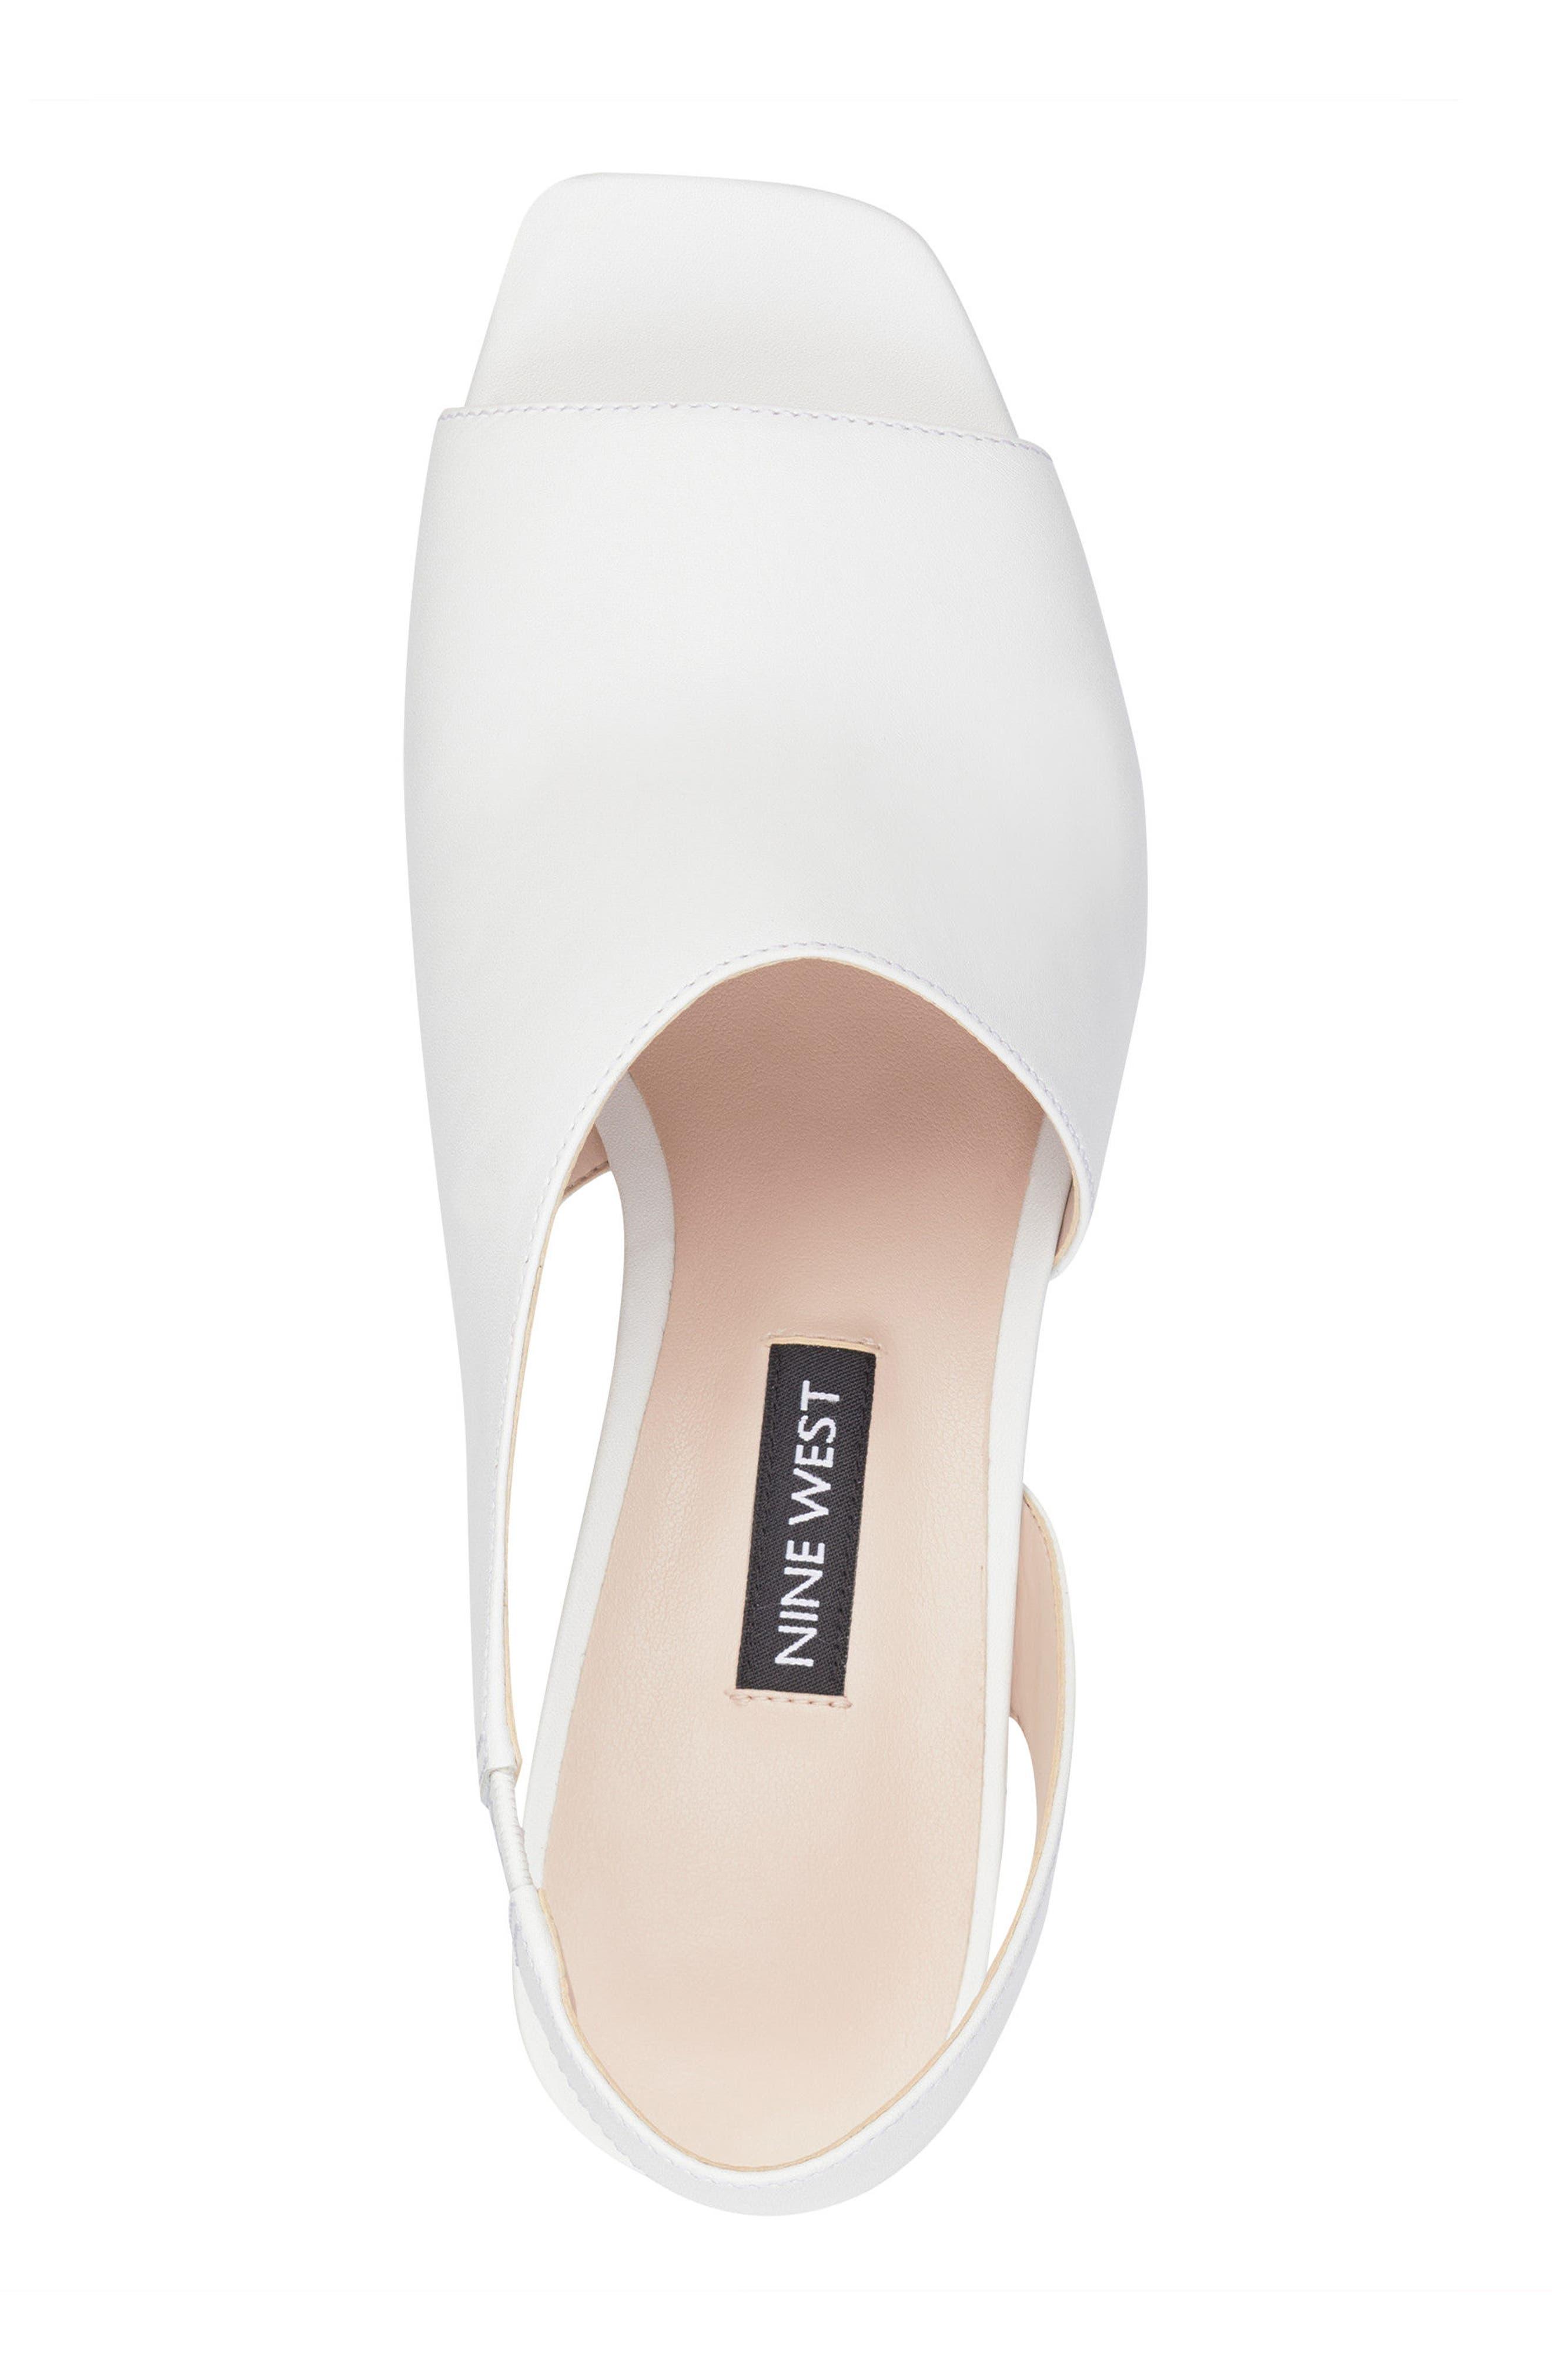 Orrus Asymmetrical Sandal,                             Alternate thumbnail 5, color,                             White Leather